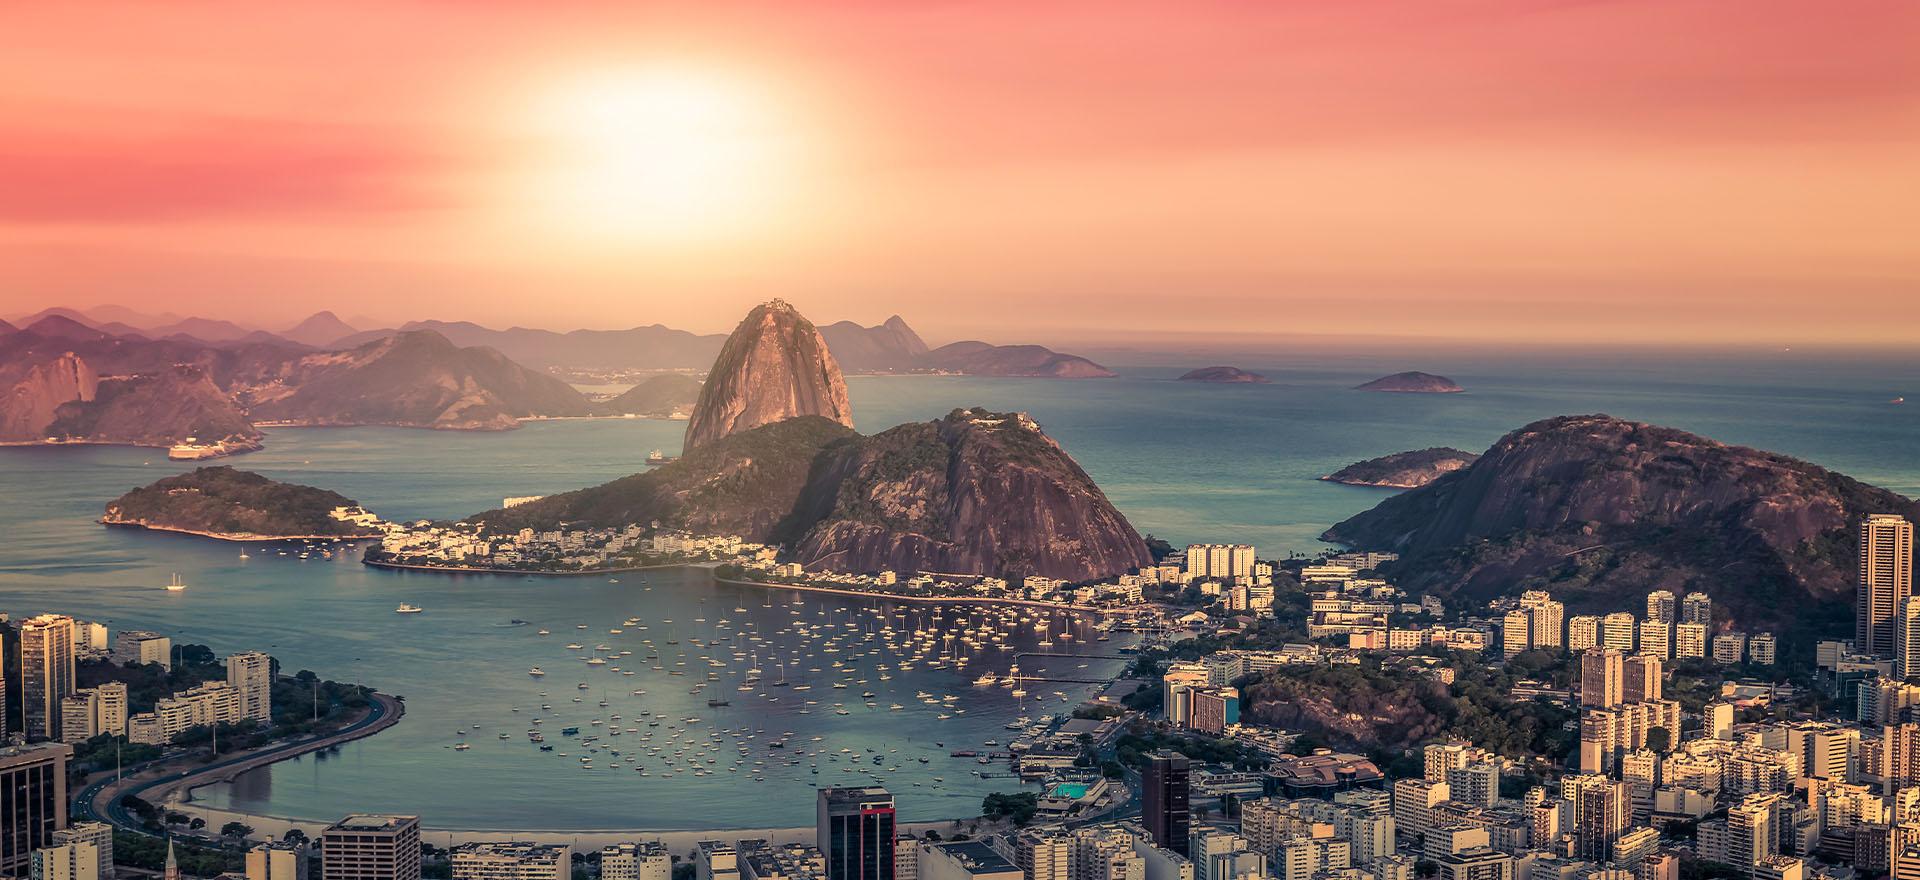 Sugarloaf mountain at sunset, Rio de Janeiro